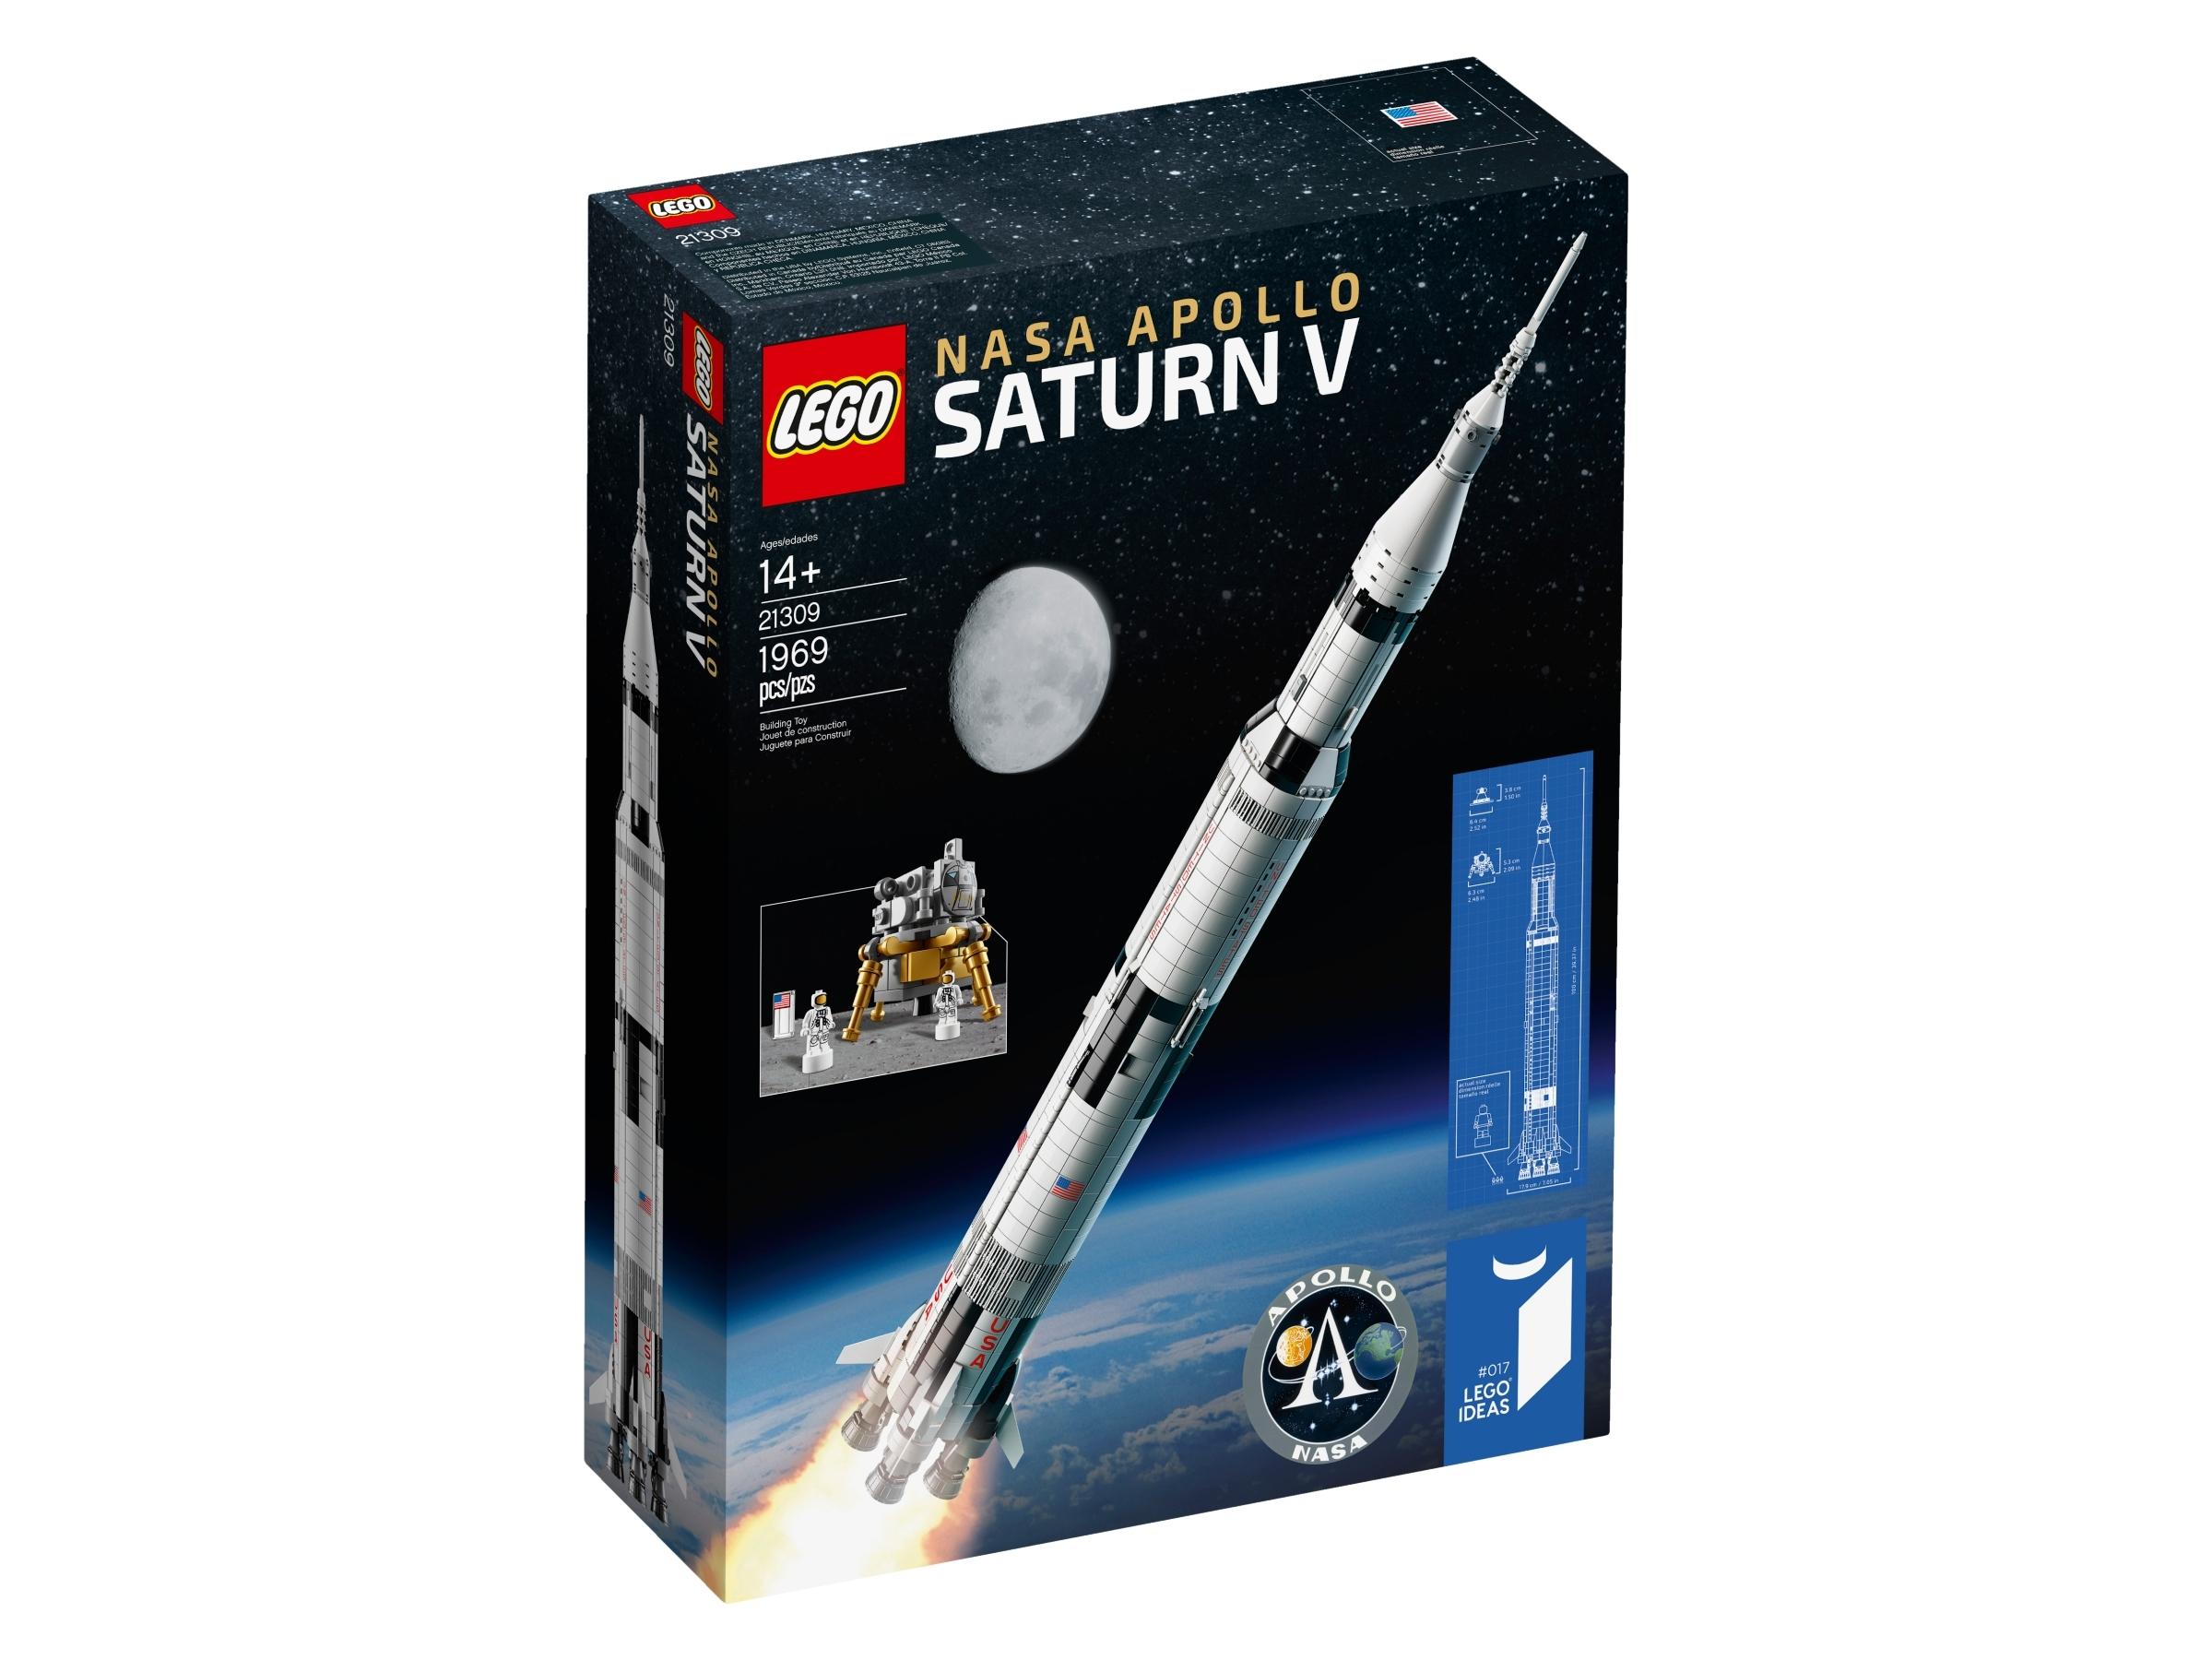 Lego New NASA Apollo Saturn V 21309 INSTRUCTIONS ONLY Manuel Booklet